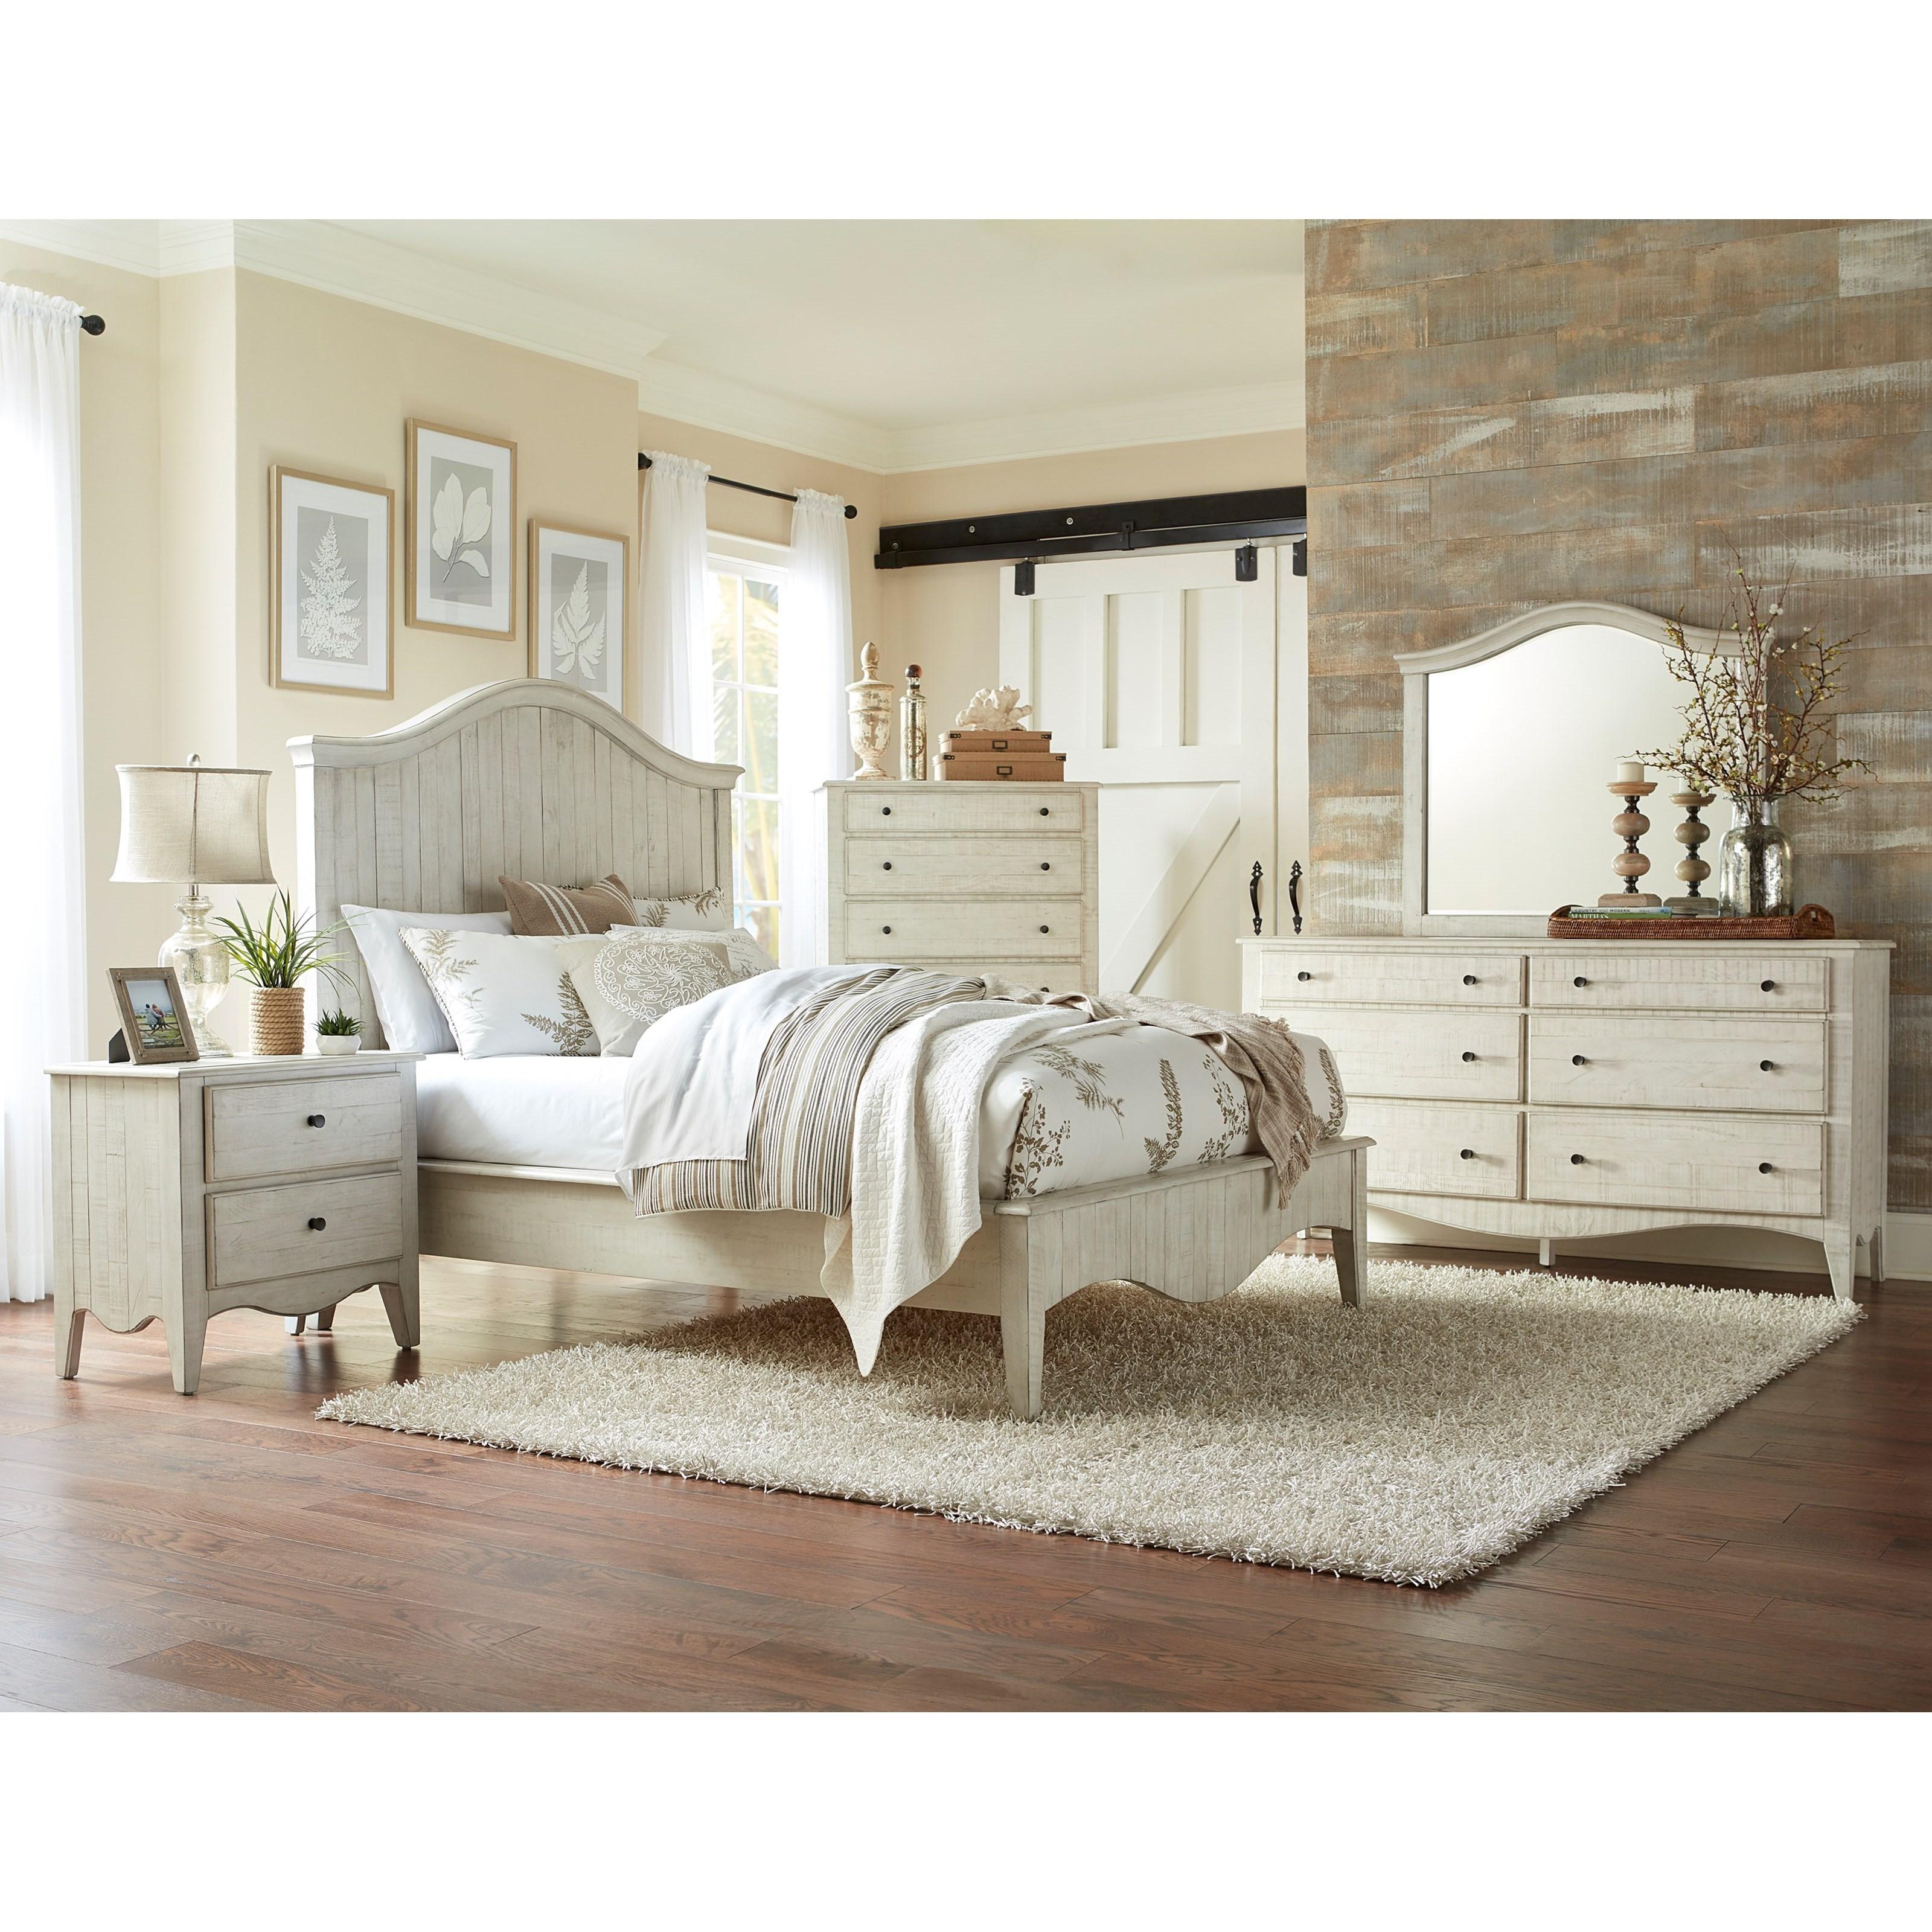 Ella Full Bedroom Group at Sadler's Home Furnishings